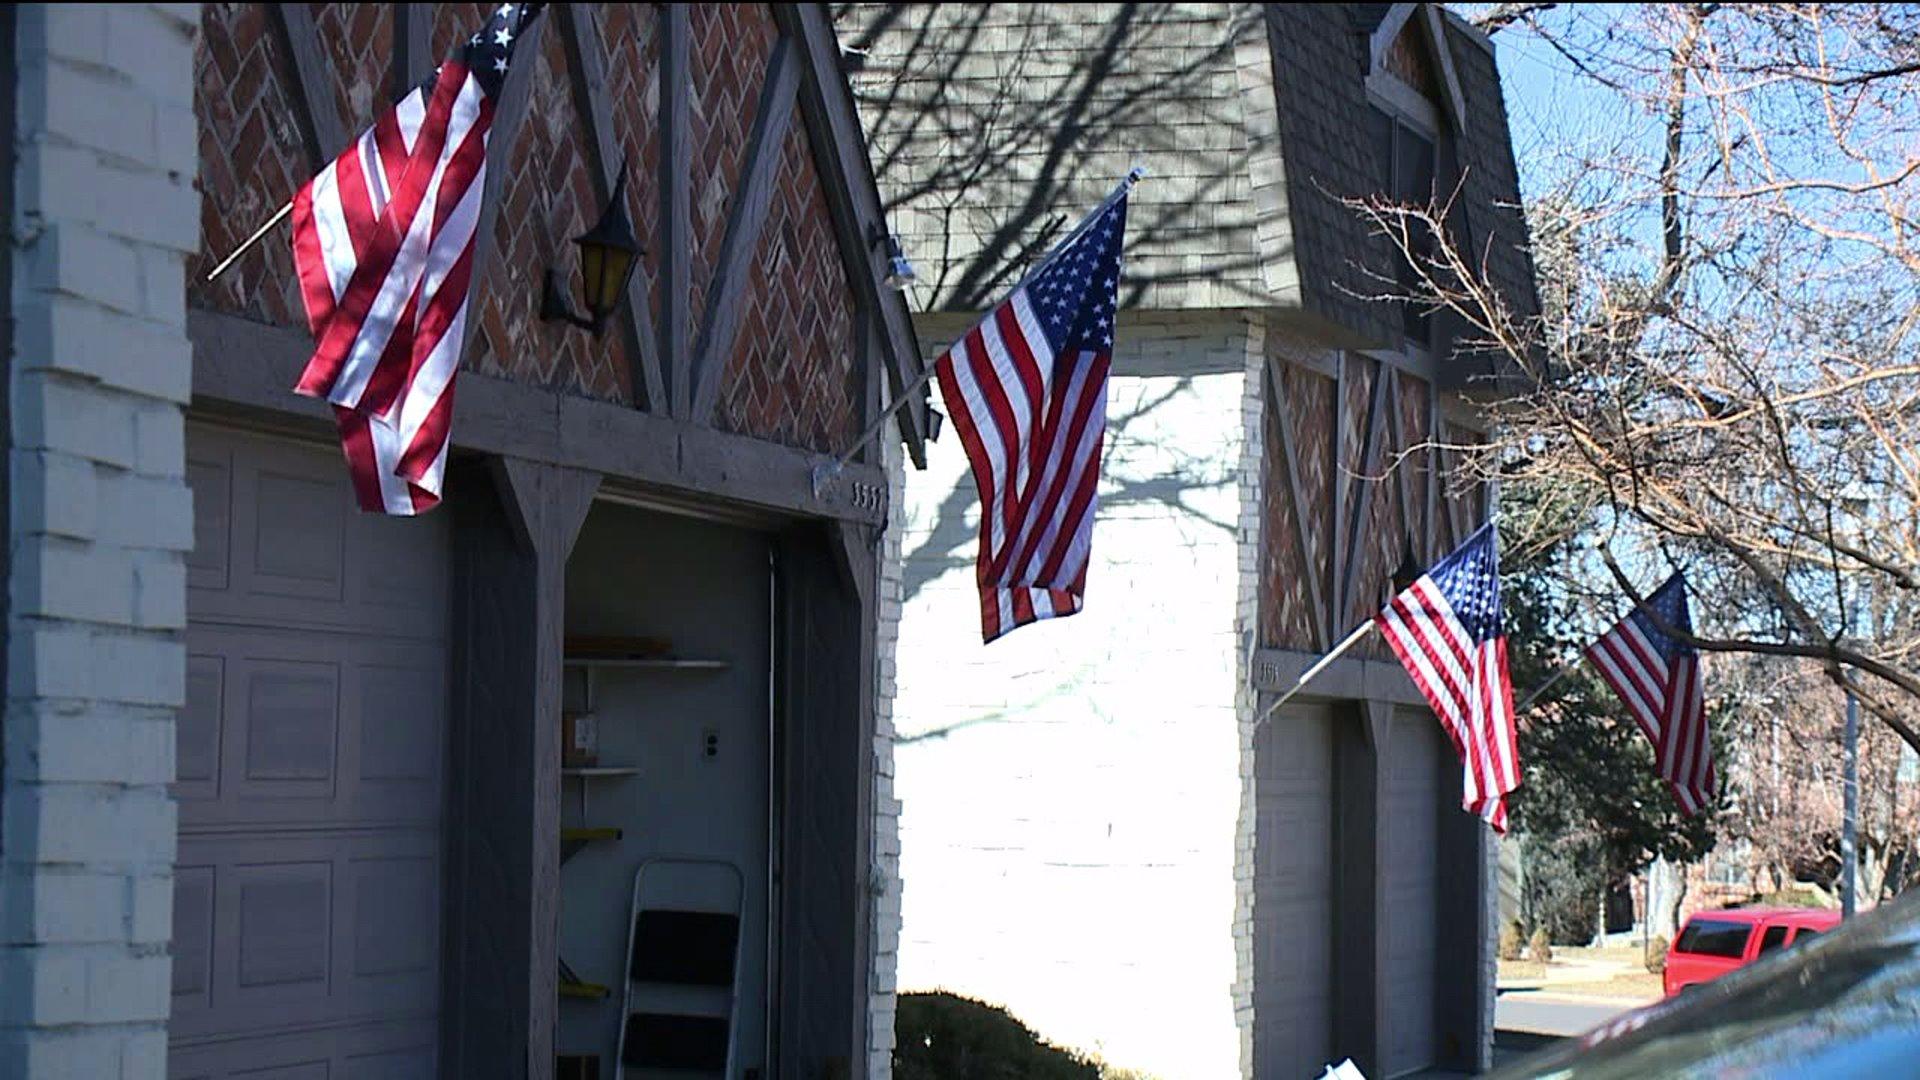 Flags in Denver's Southmoor neighborhood